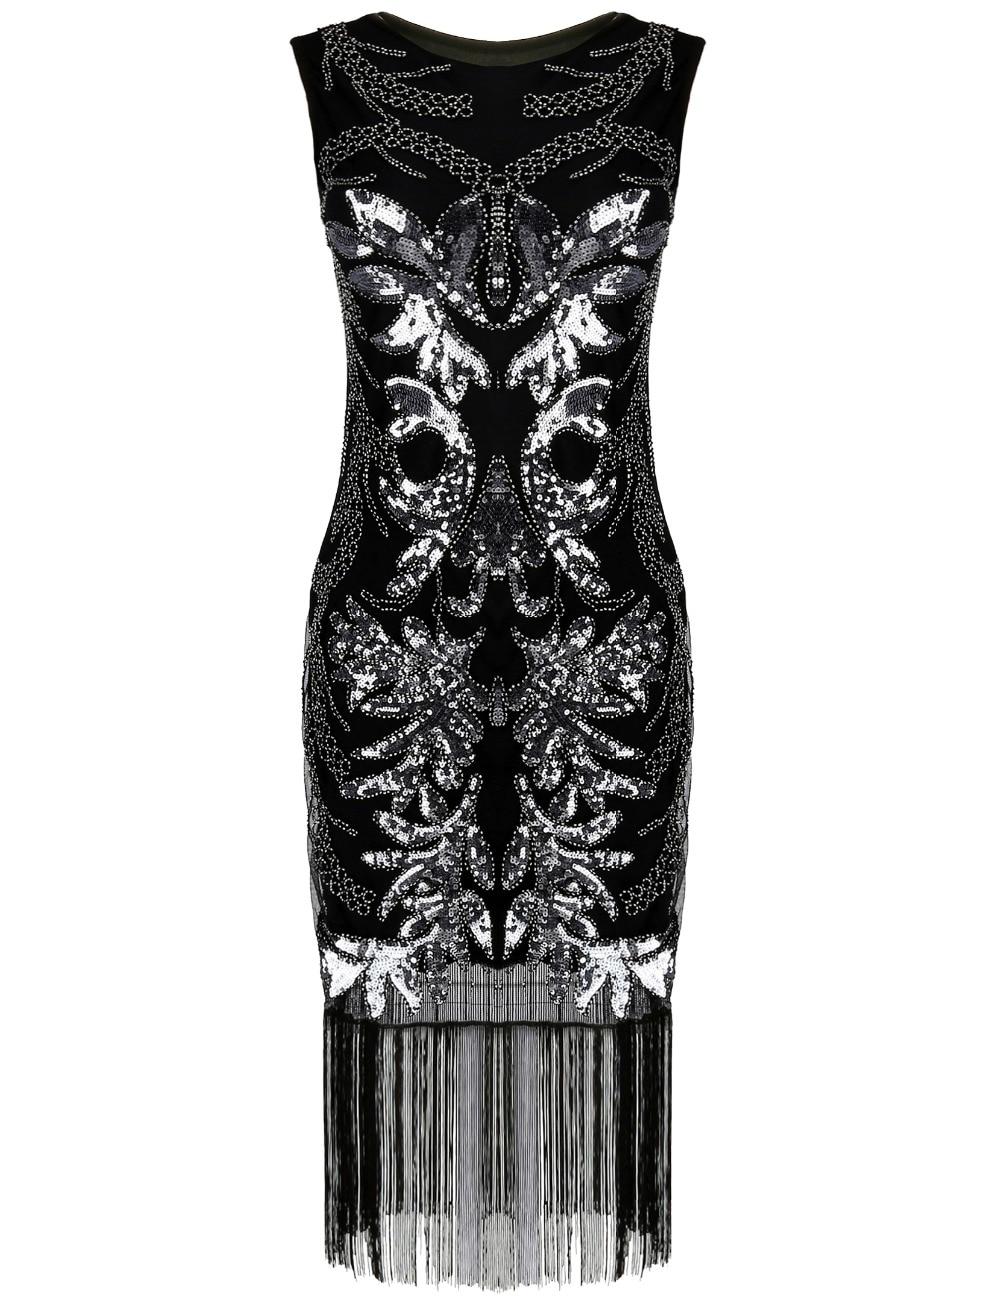 PrettyGuide Women's 1920s Gatsby Art Deco Sequin Beads Fringed Hem Fancy Inspired Flapper Dress Cocktail Party Dress